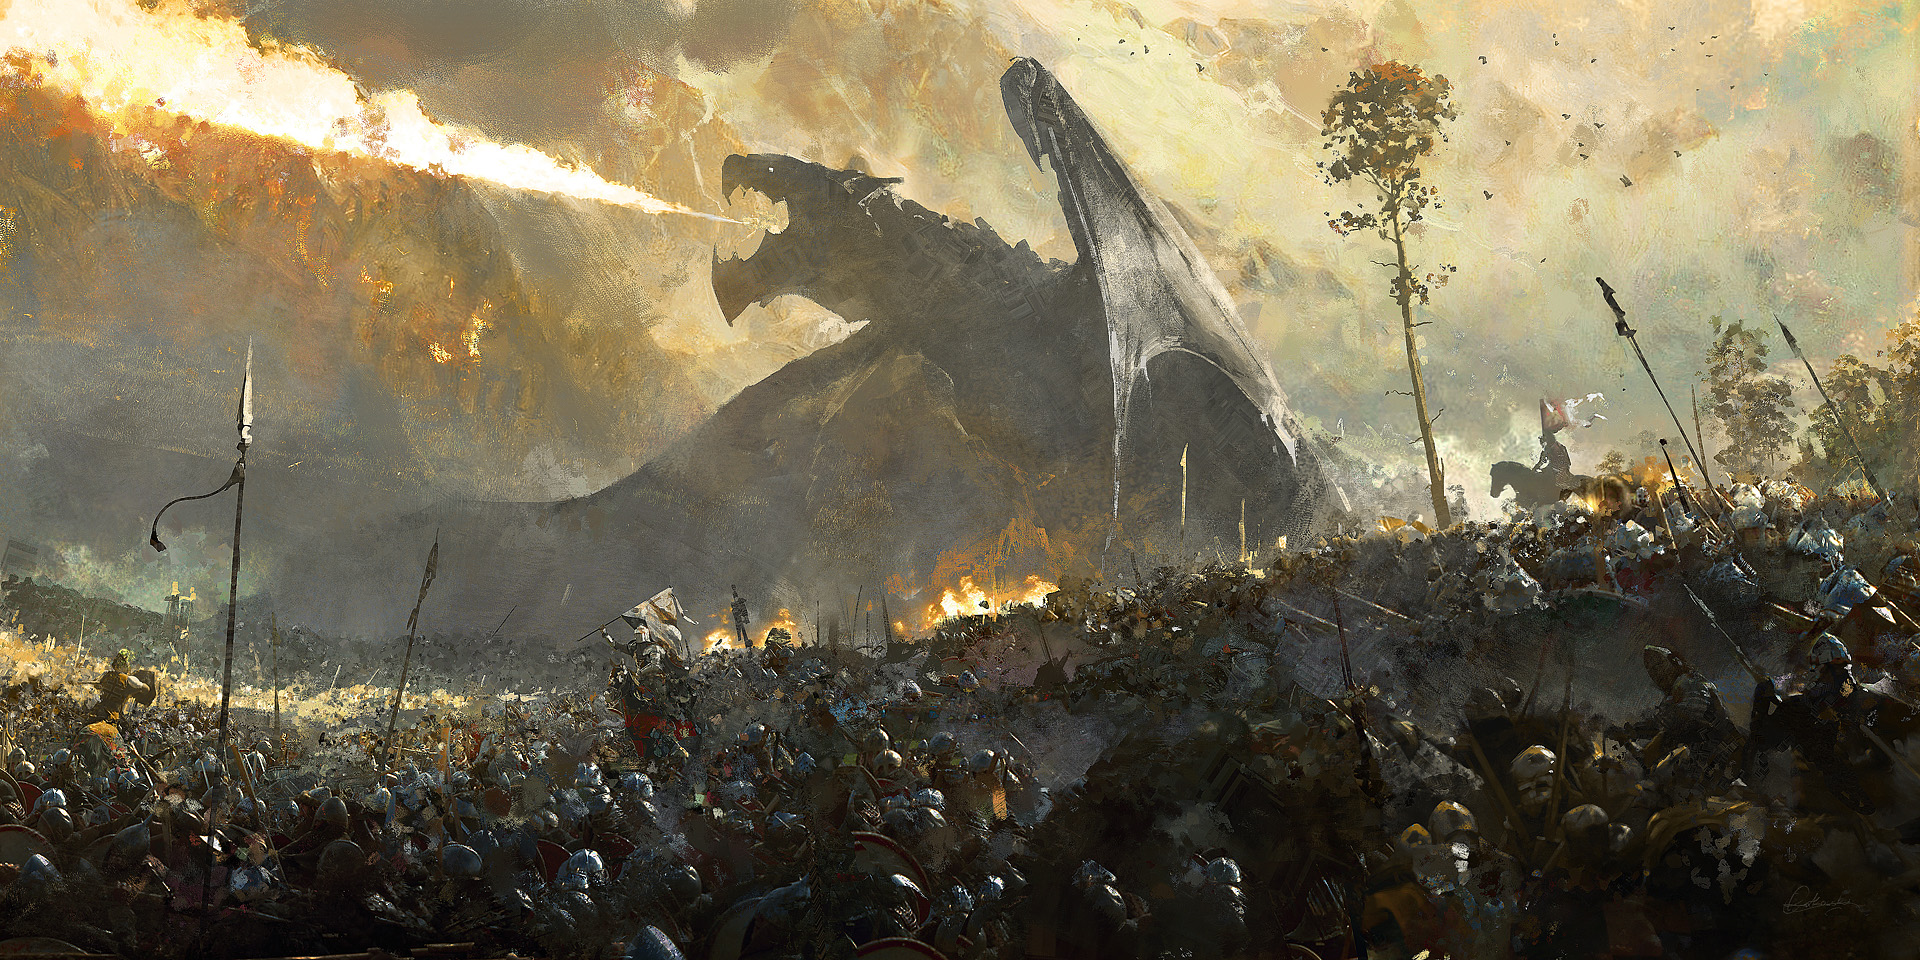 General 1920x960 fantasy art war battle artwork